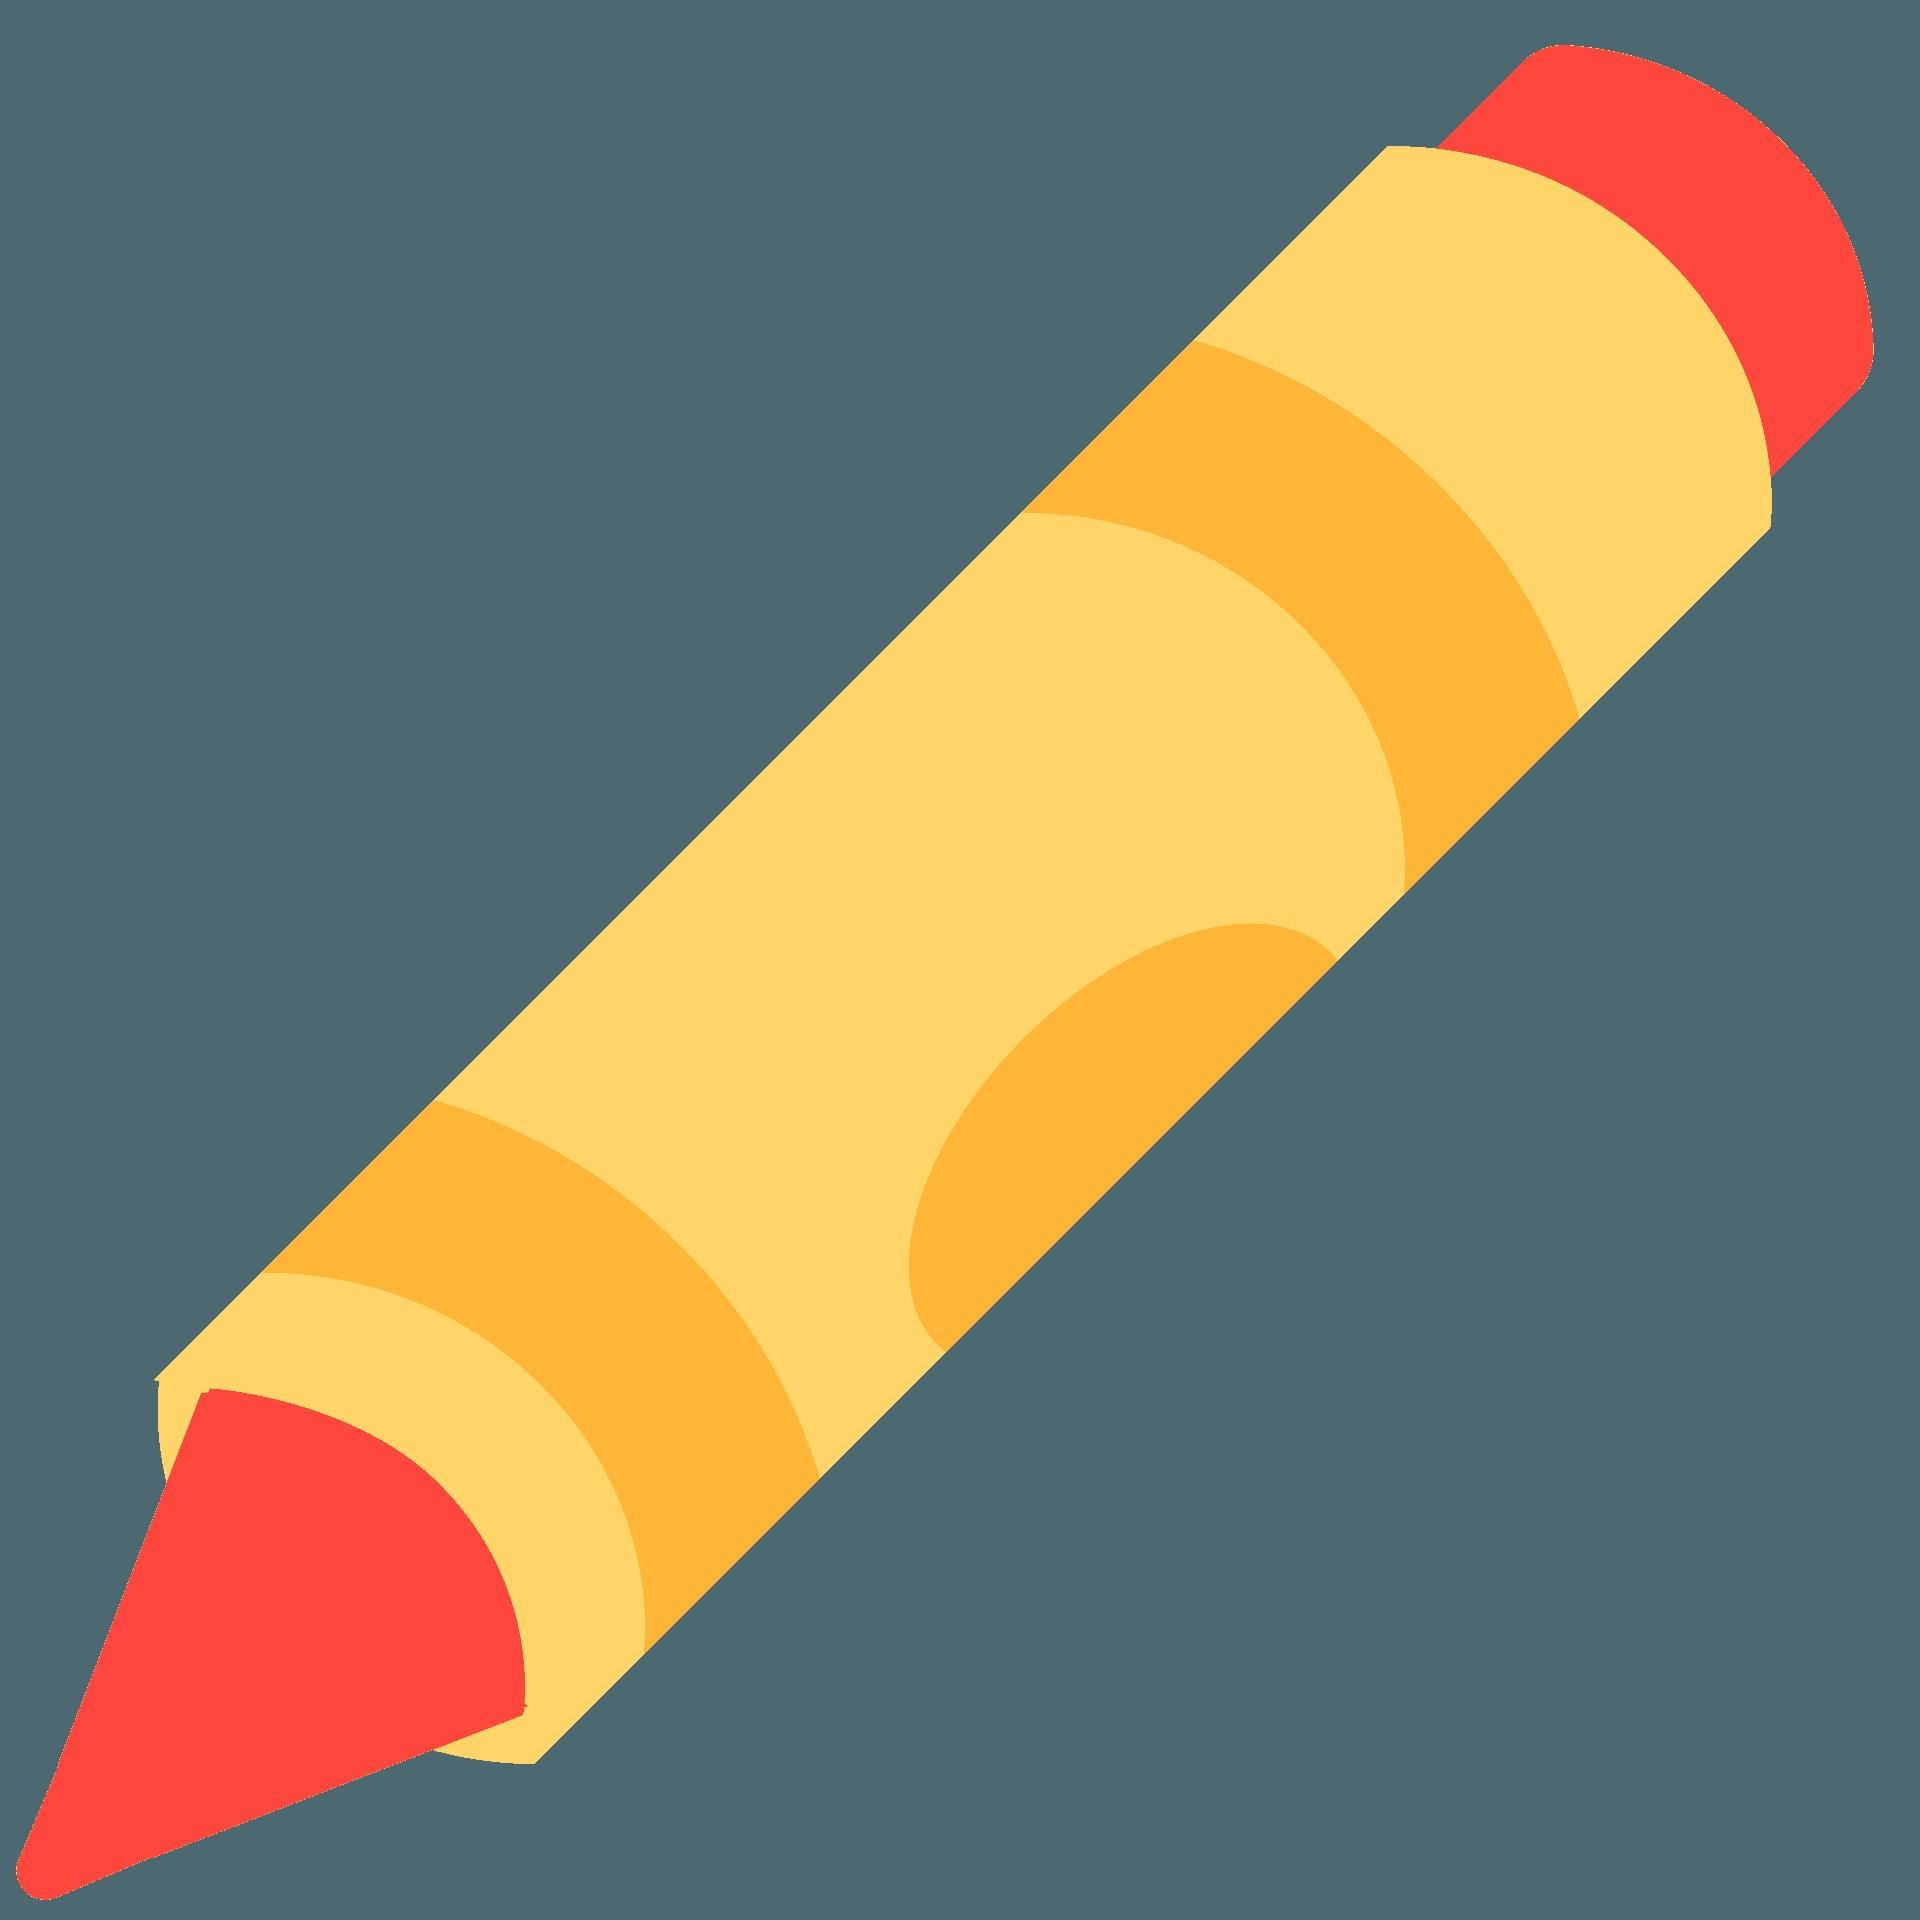 Crayon Emoji Clipart Free Download Transparent Png Creazilla